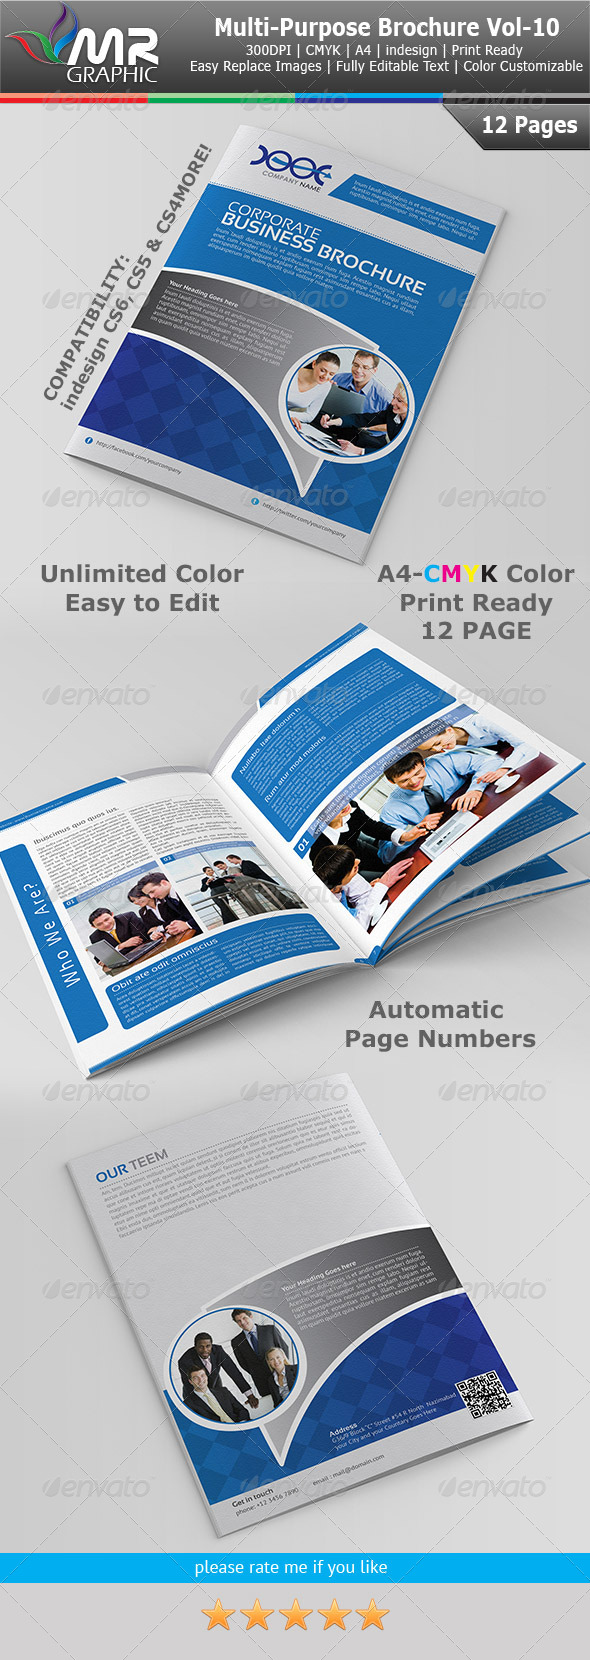 Multipurpose Business Brochure Template Vol-10 - Corporate Brochures